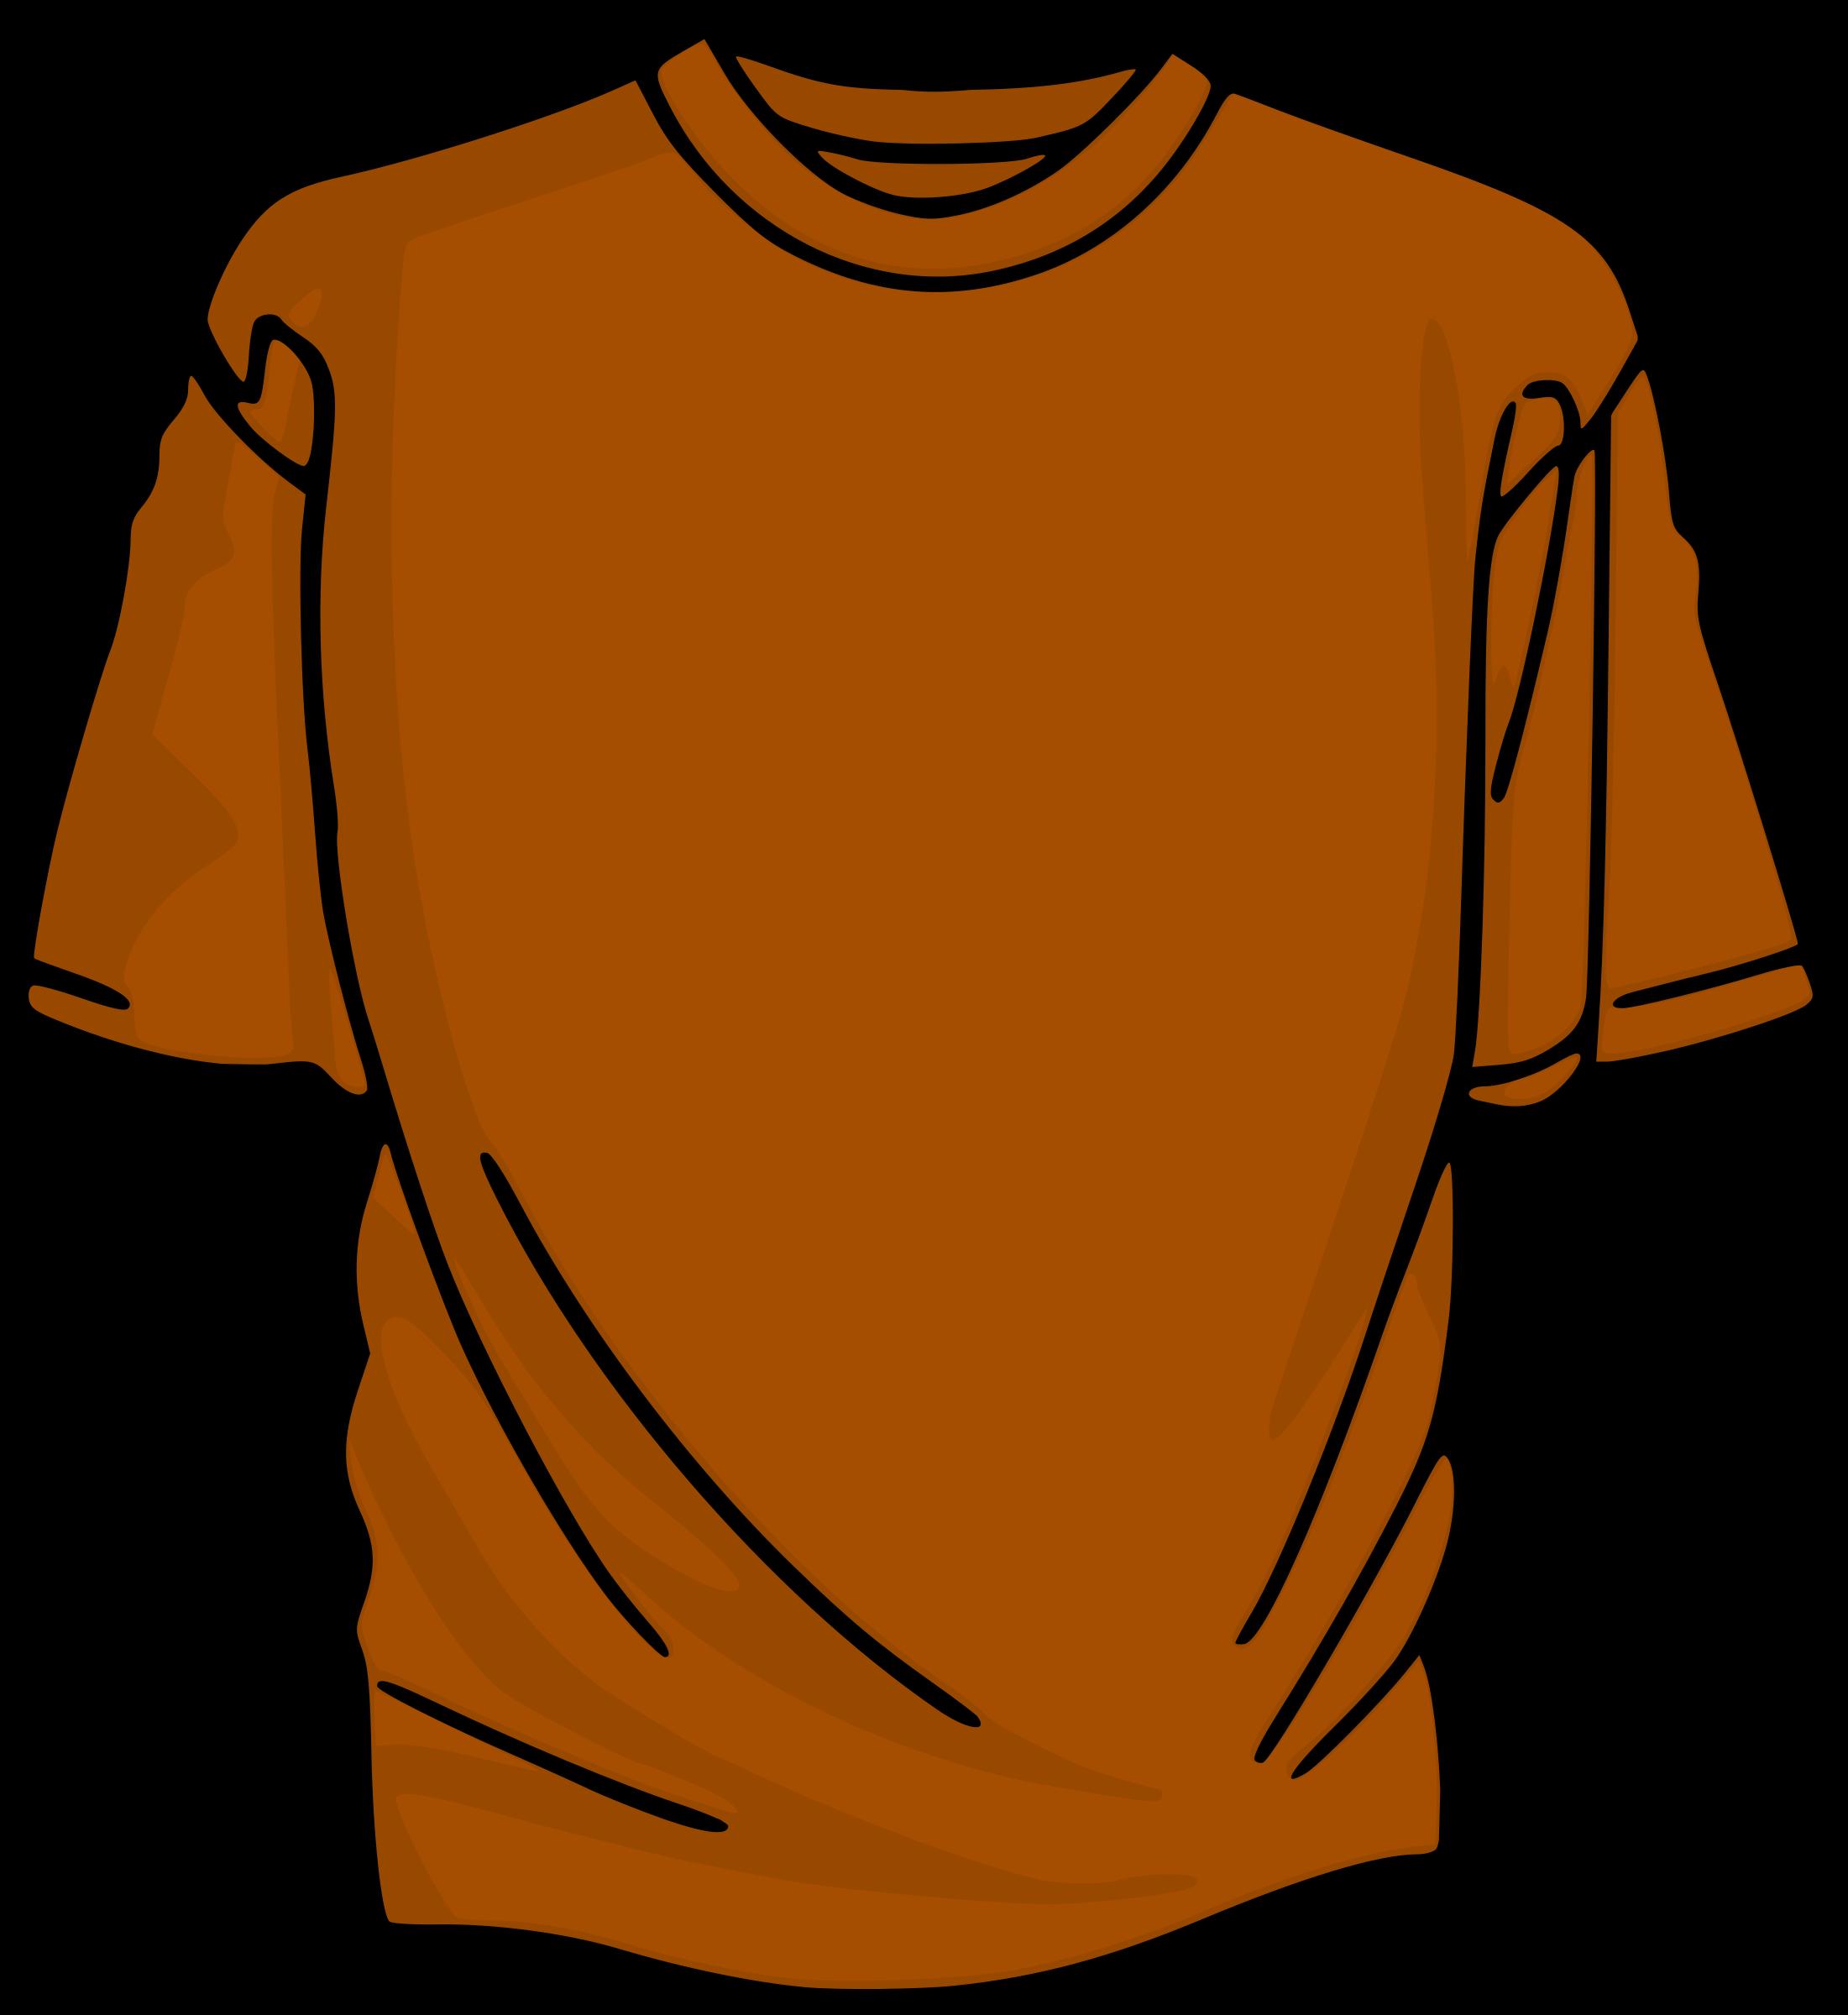 Orange t big image. Clipart shirt cartoon